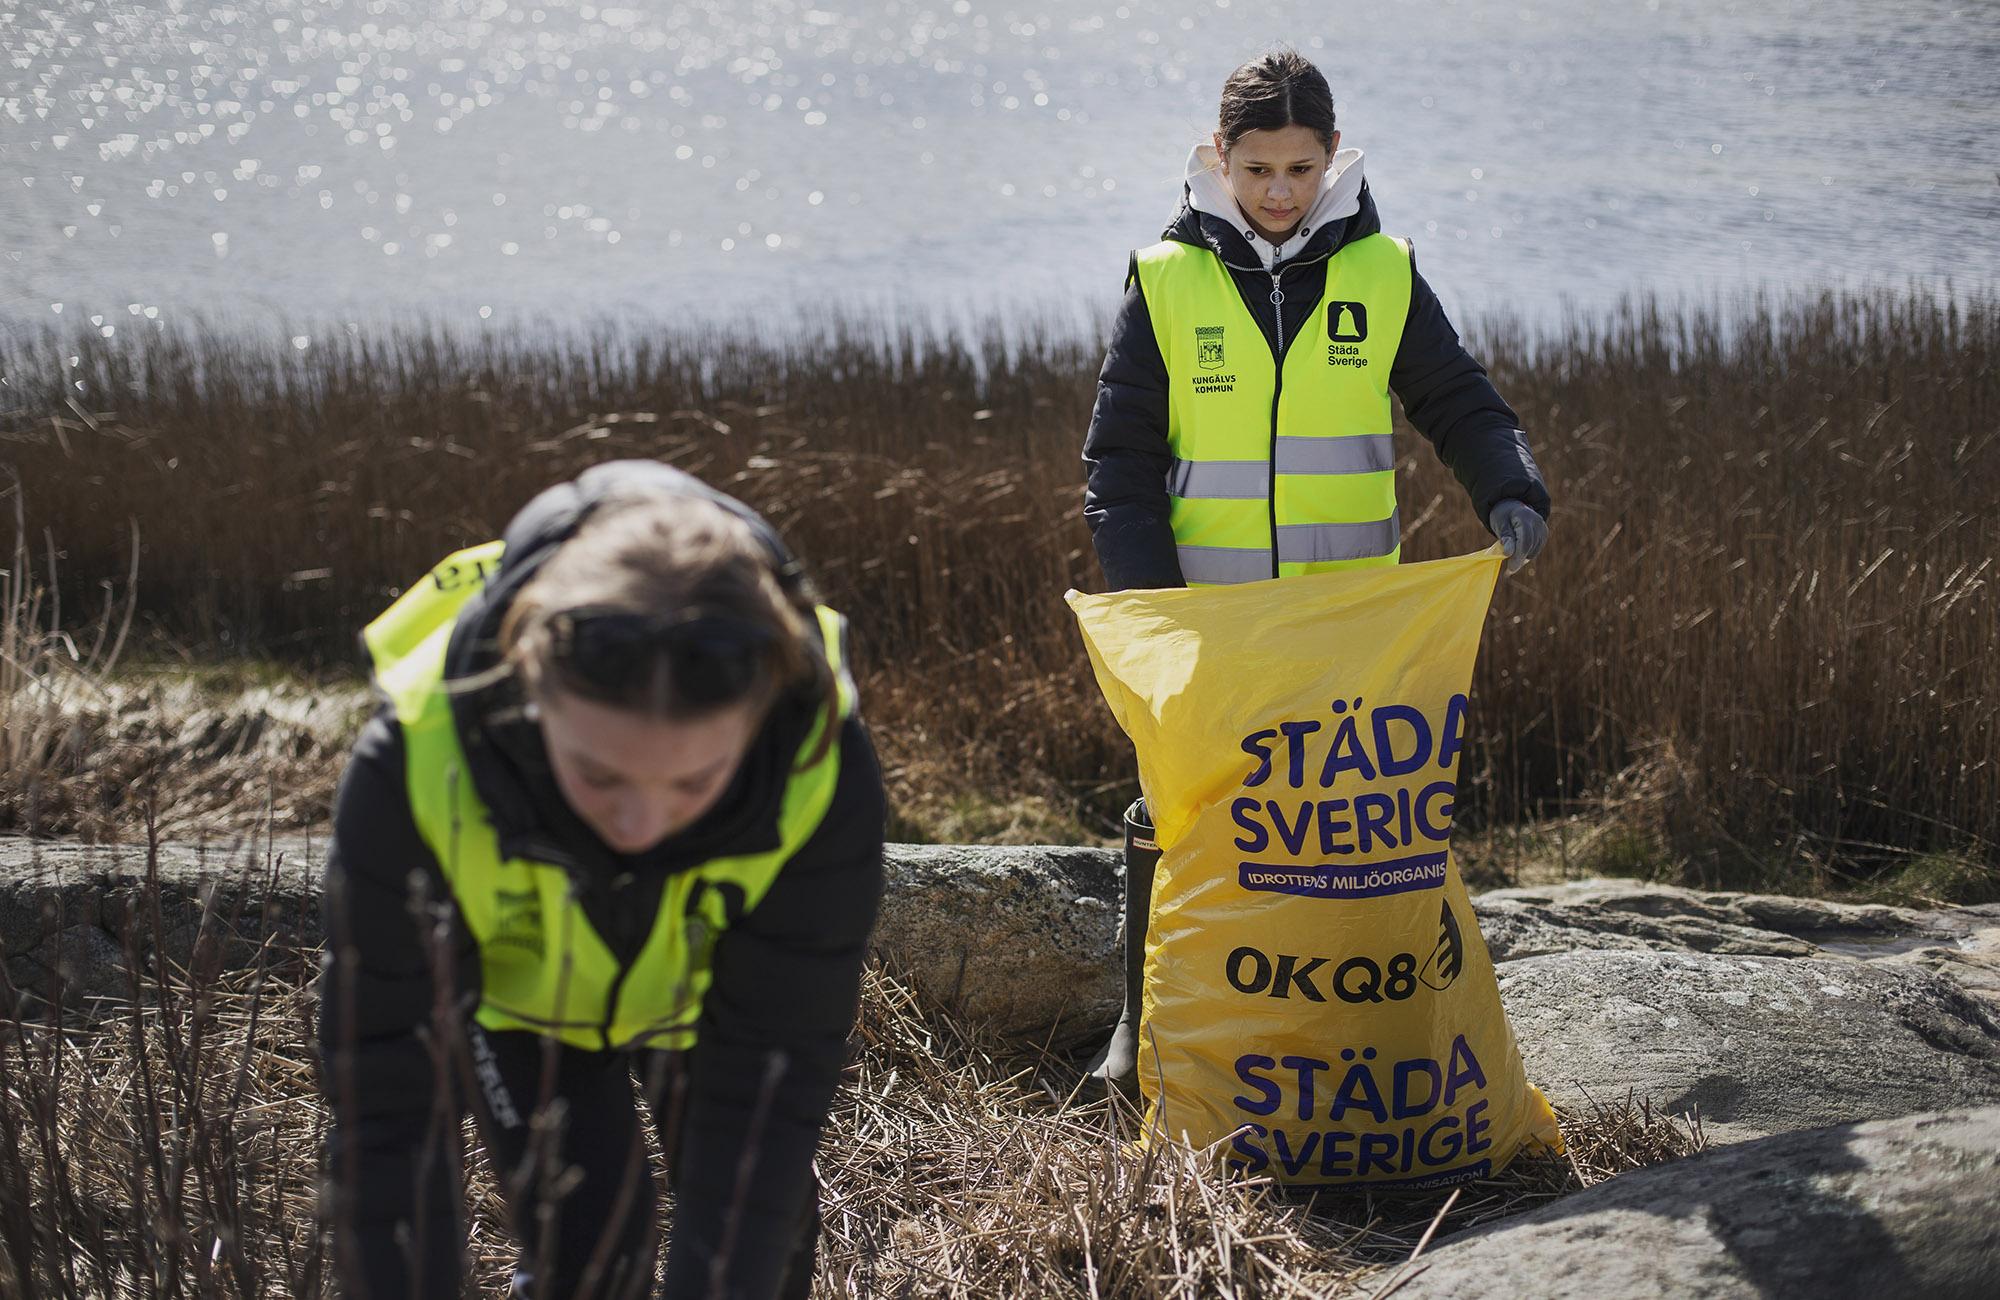 Kuststädande unga miljöhjältar uppmärksammas